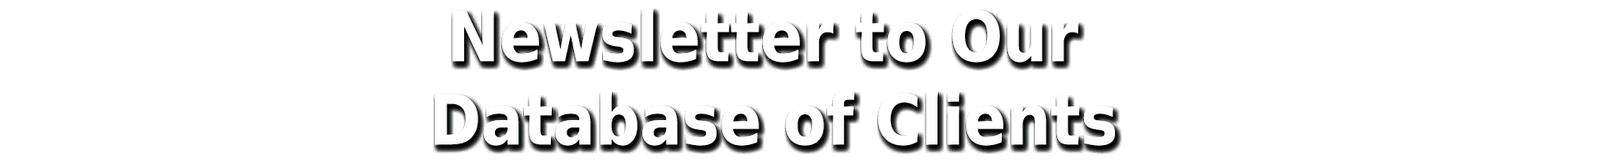 MACS Newsletters title